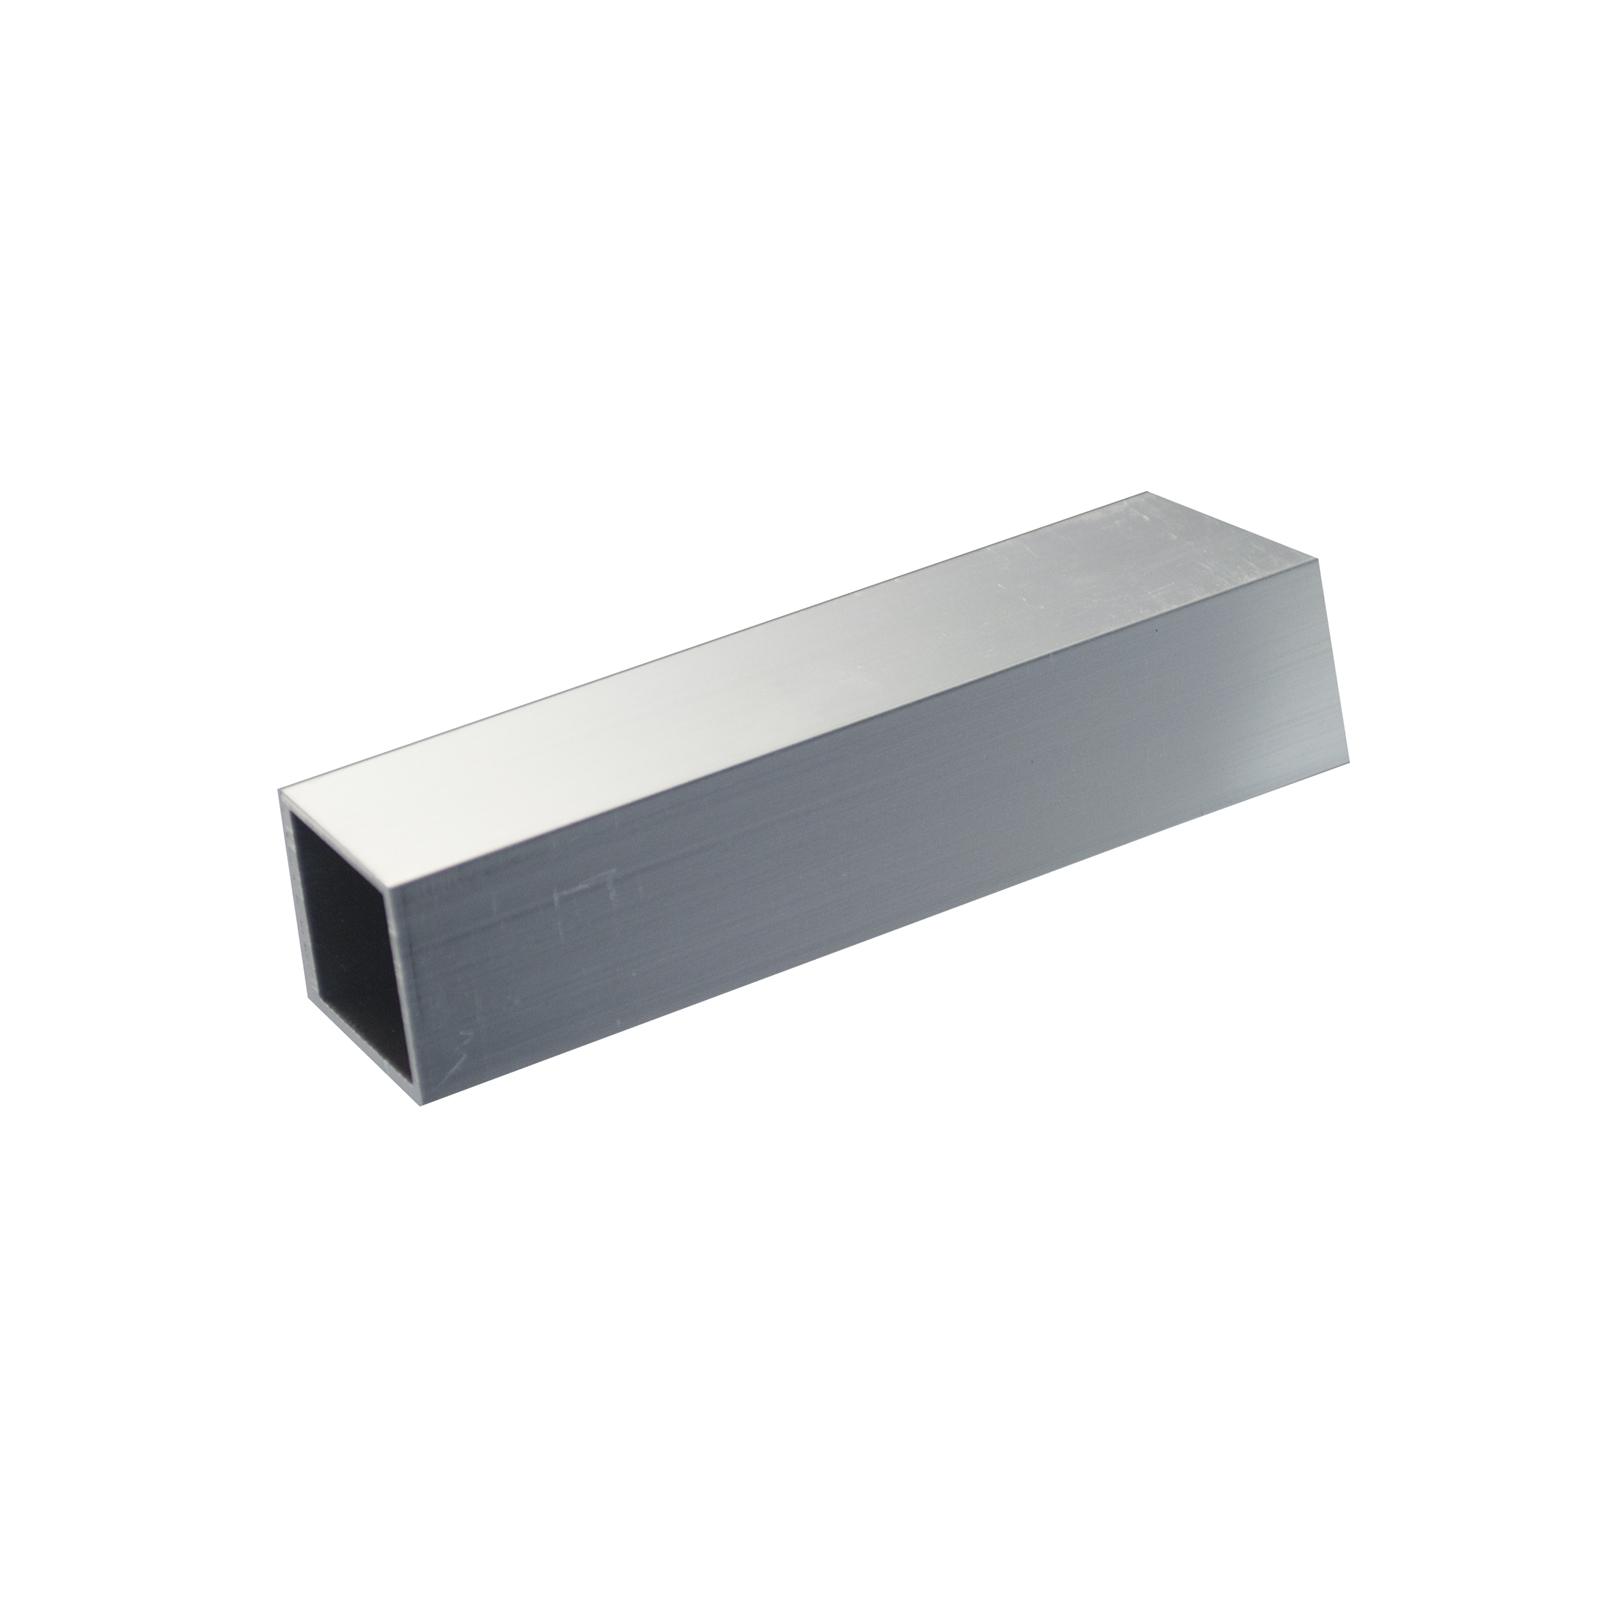 Metal Mate 19 x 19 x 1.2mm 3m Aluminium Square Box Tube